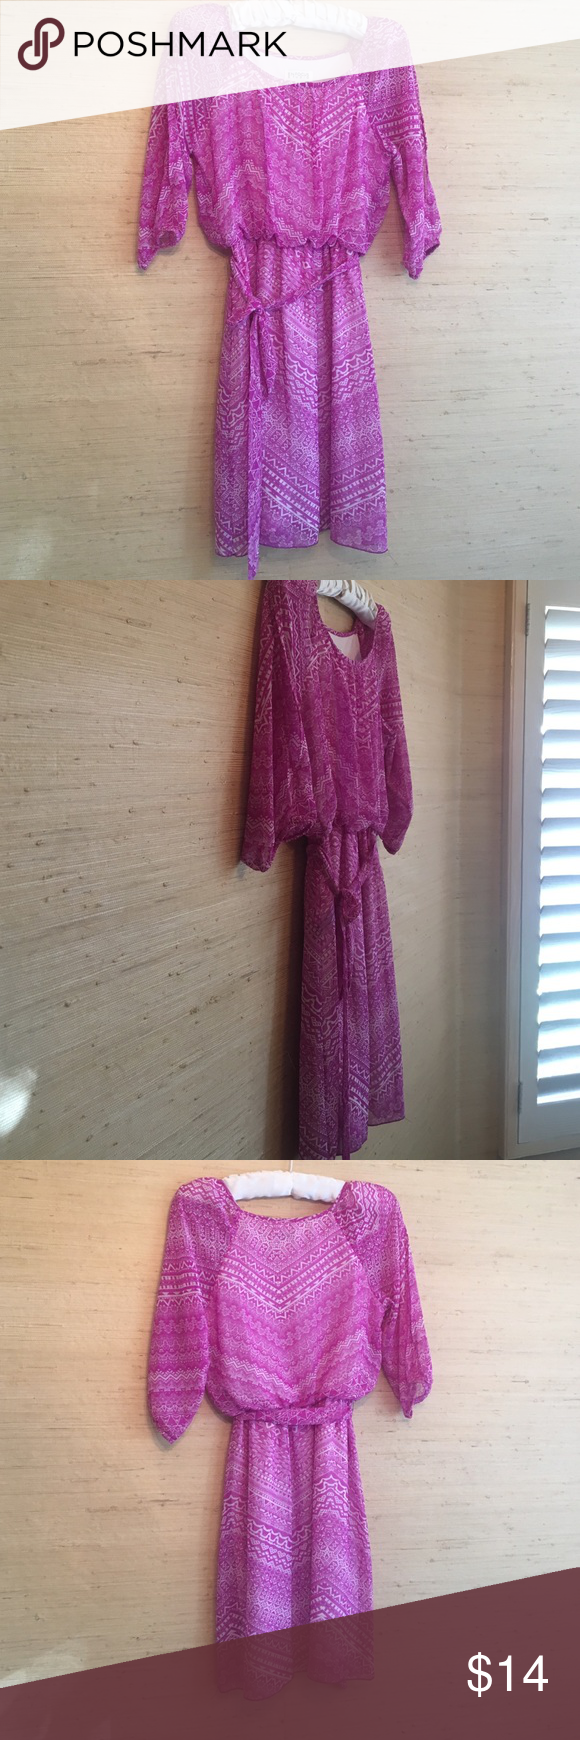 🎉FINAL PRICE🎉En Focus Studio Dress 🎉FINAL PRICE🎉Cute En Focus Studio dress.  Pink and white print. Size 4.  Comes with belt.  Gently used. EnFocus Studio Dresses Midi